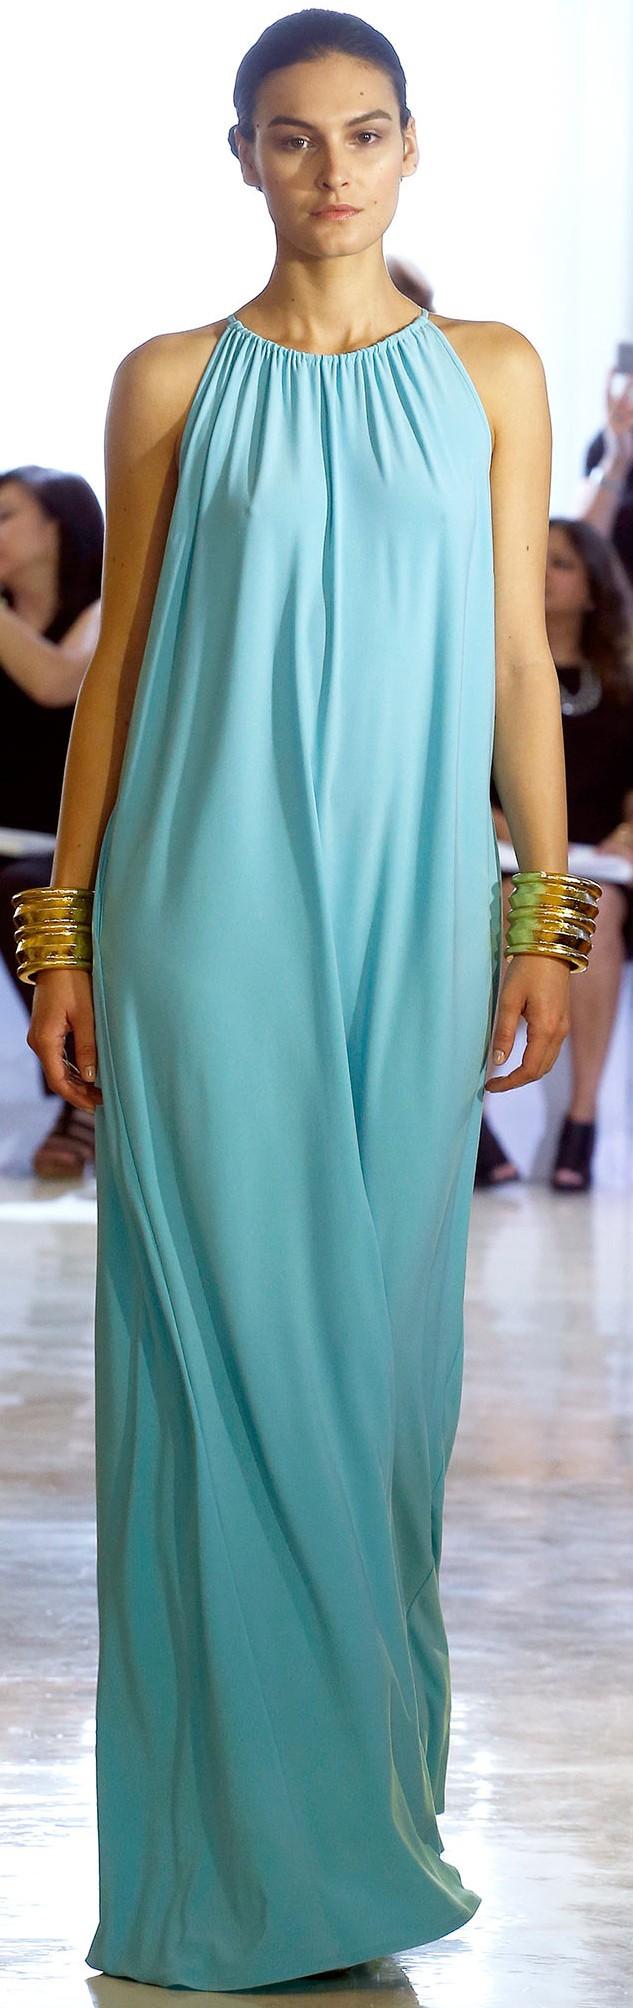 Rosie Huntington ... Ufff | 005 Nightwear | Pinterest | Lingerie